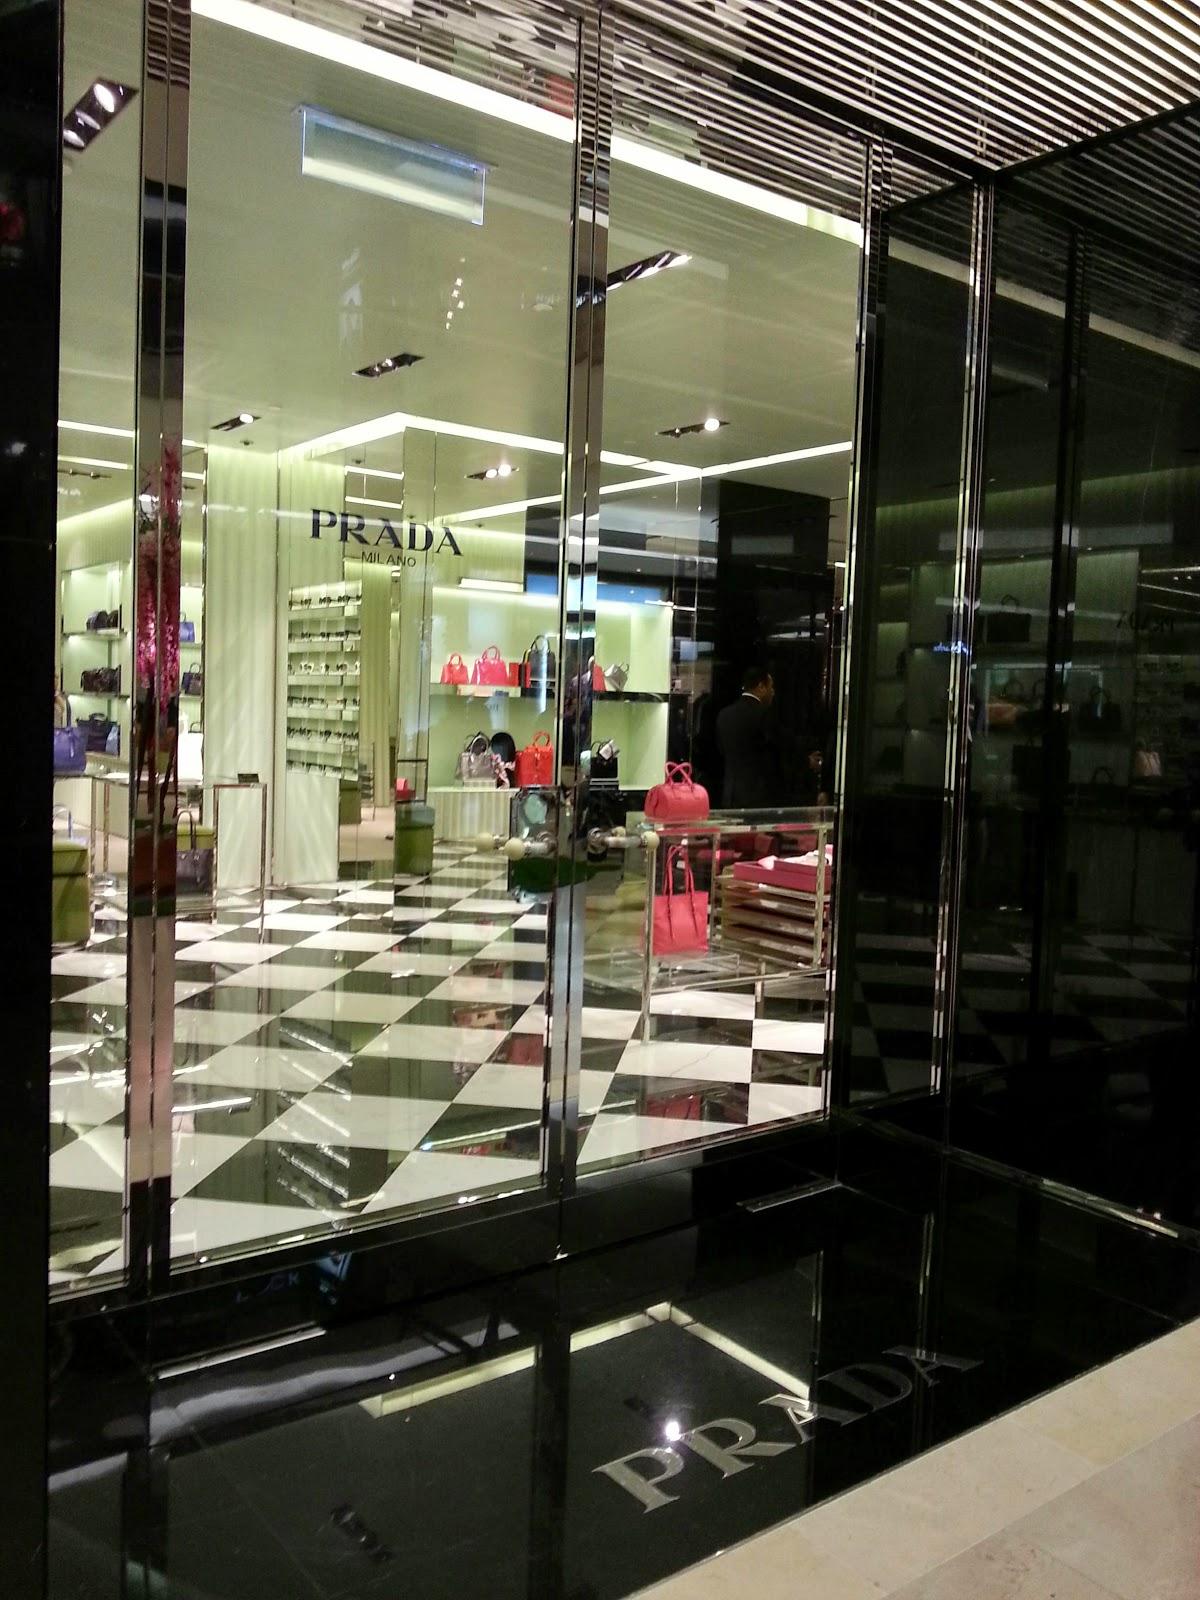 6db02c1a5133 The Chic Sac  Europe Shopping Spree - Last Minute Trip!